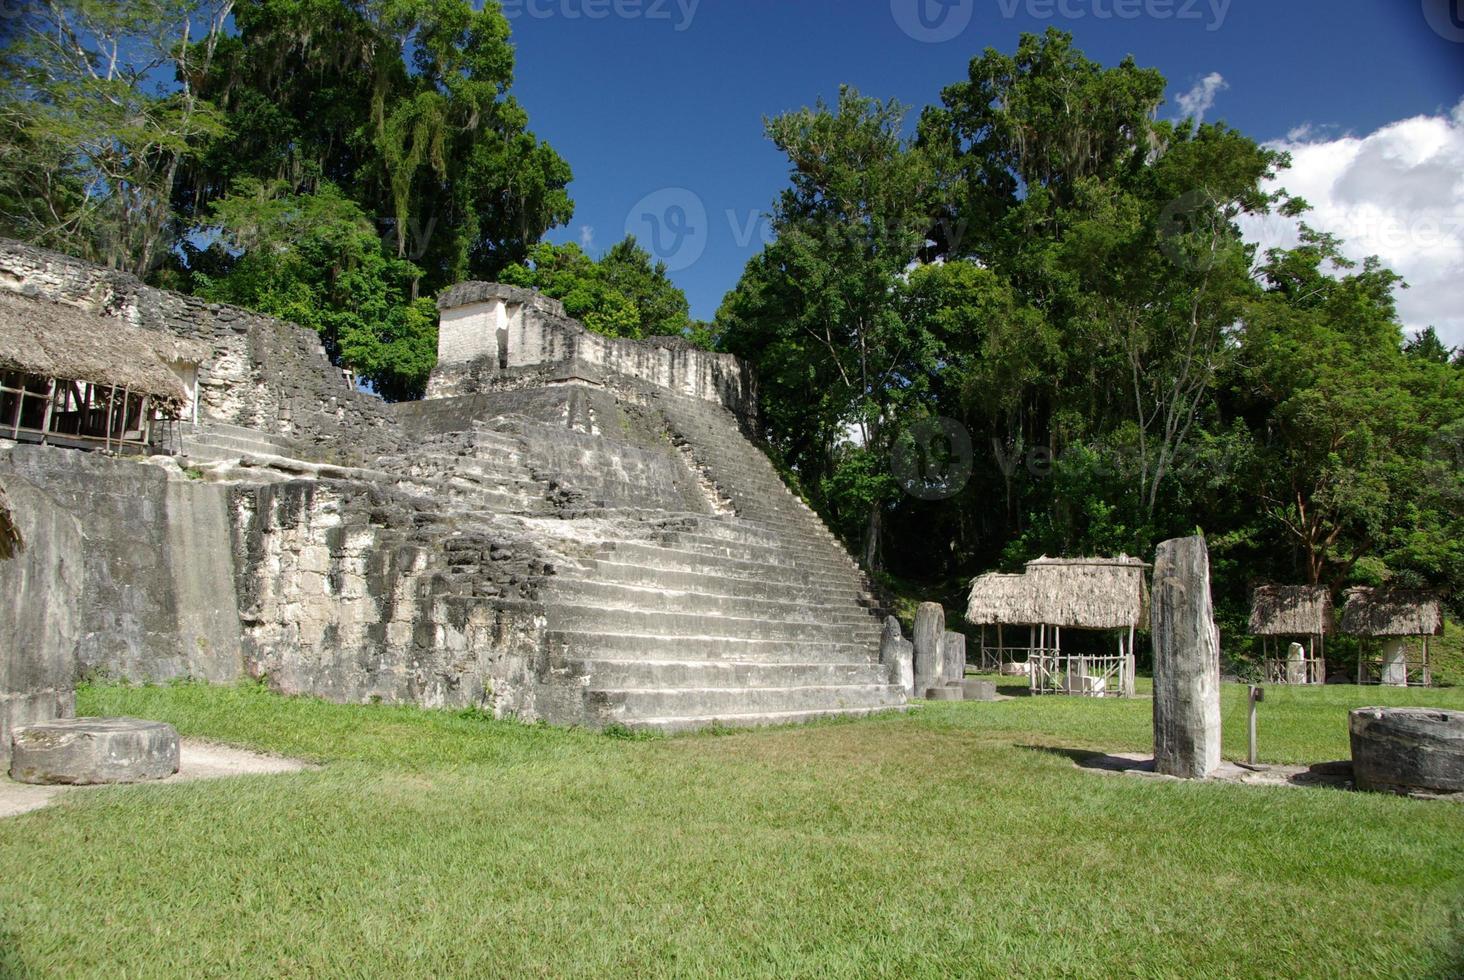 Maya-Ruinen in Guatemala foto